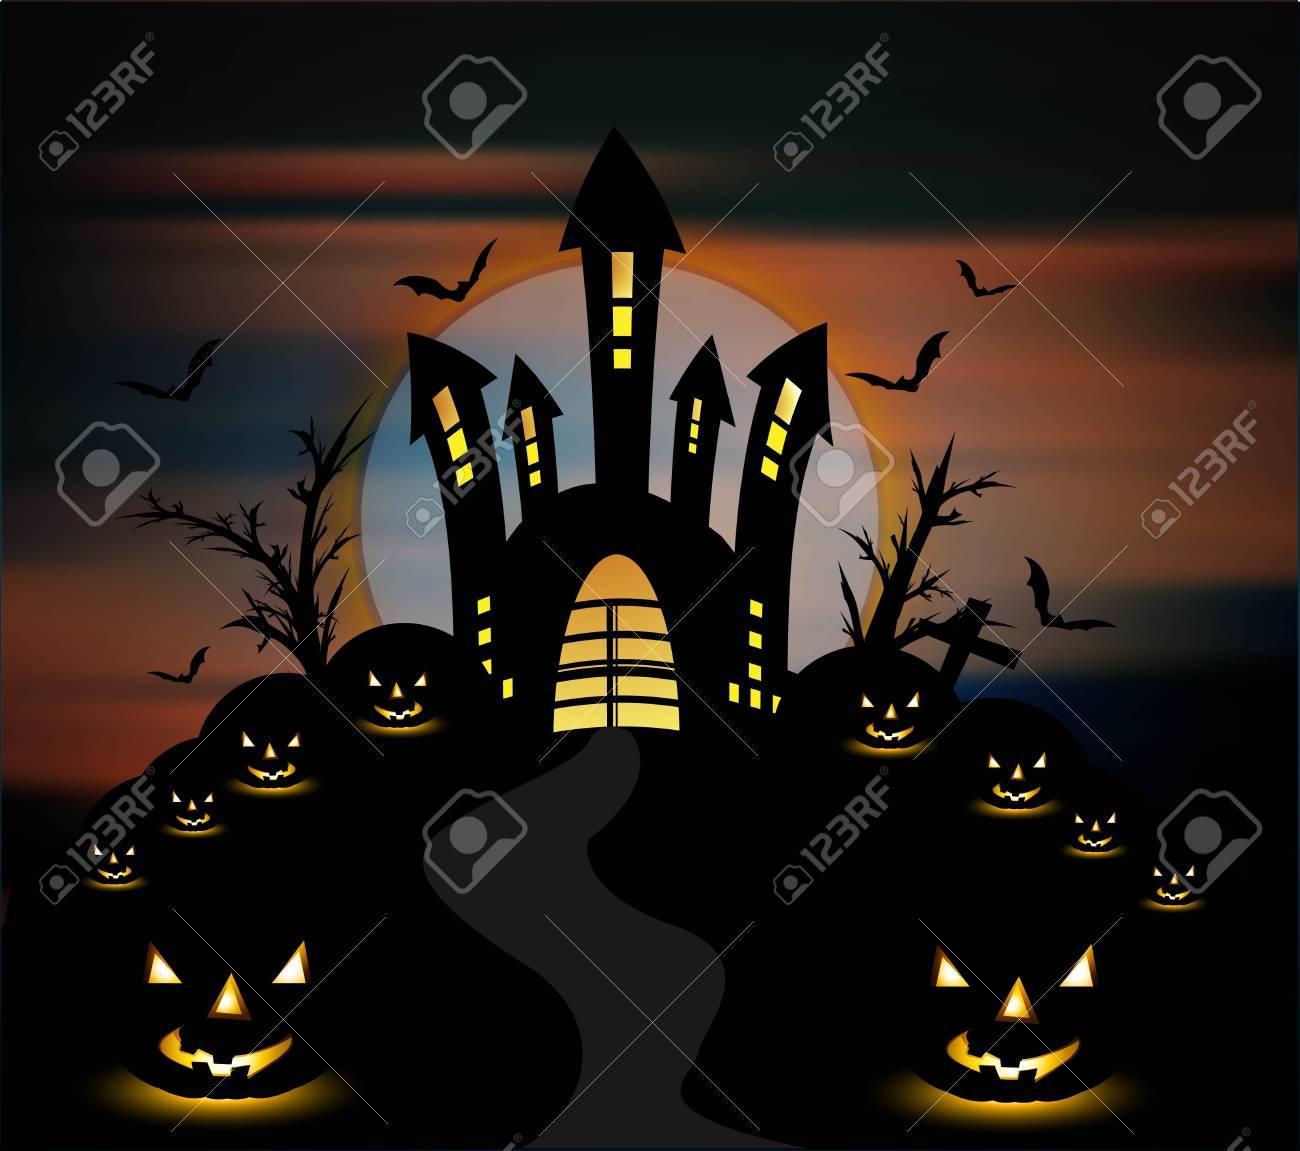 Halloween night with pumpkins party vector background Stock Vector - 18838554